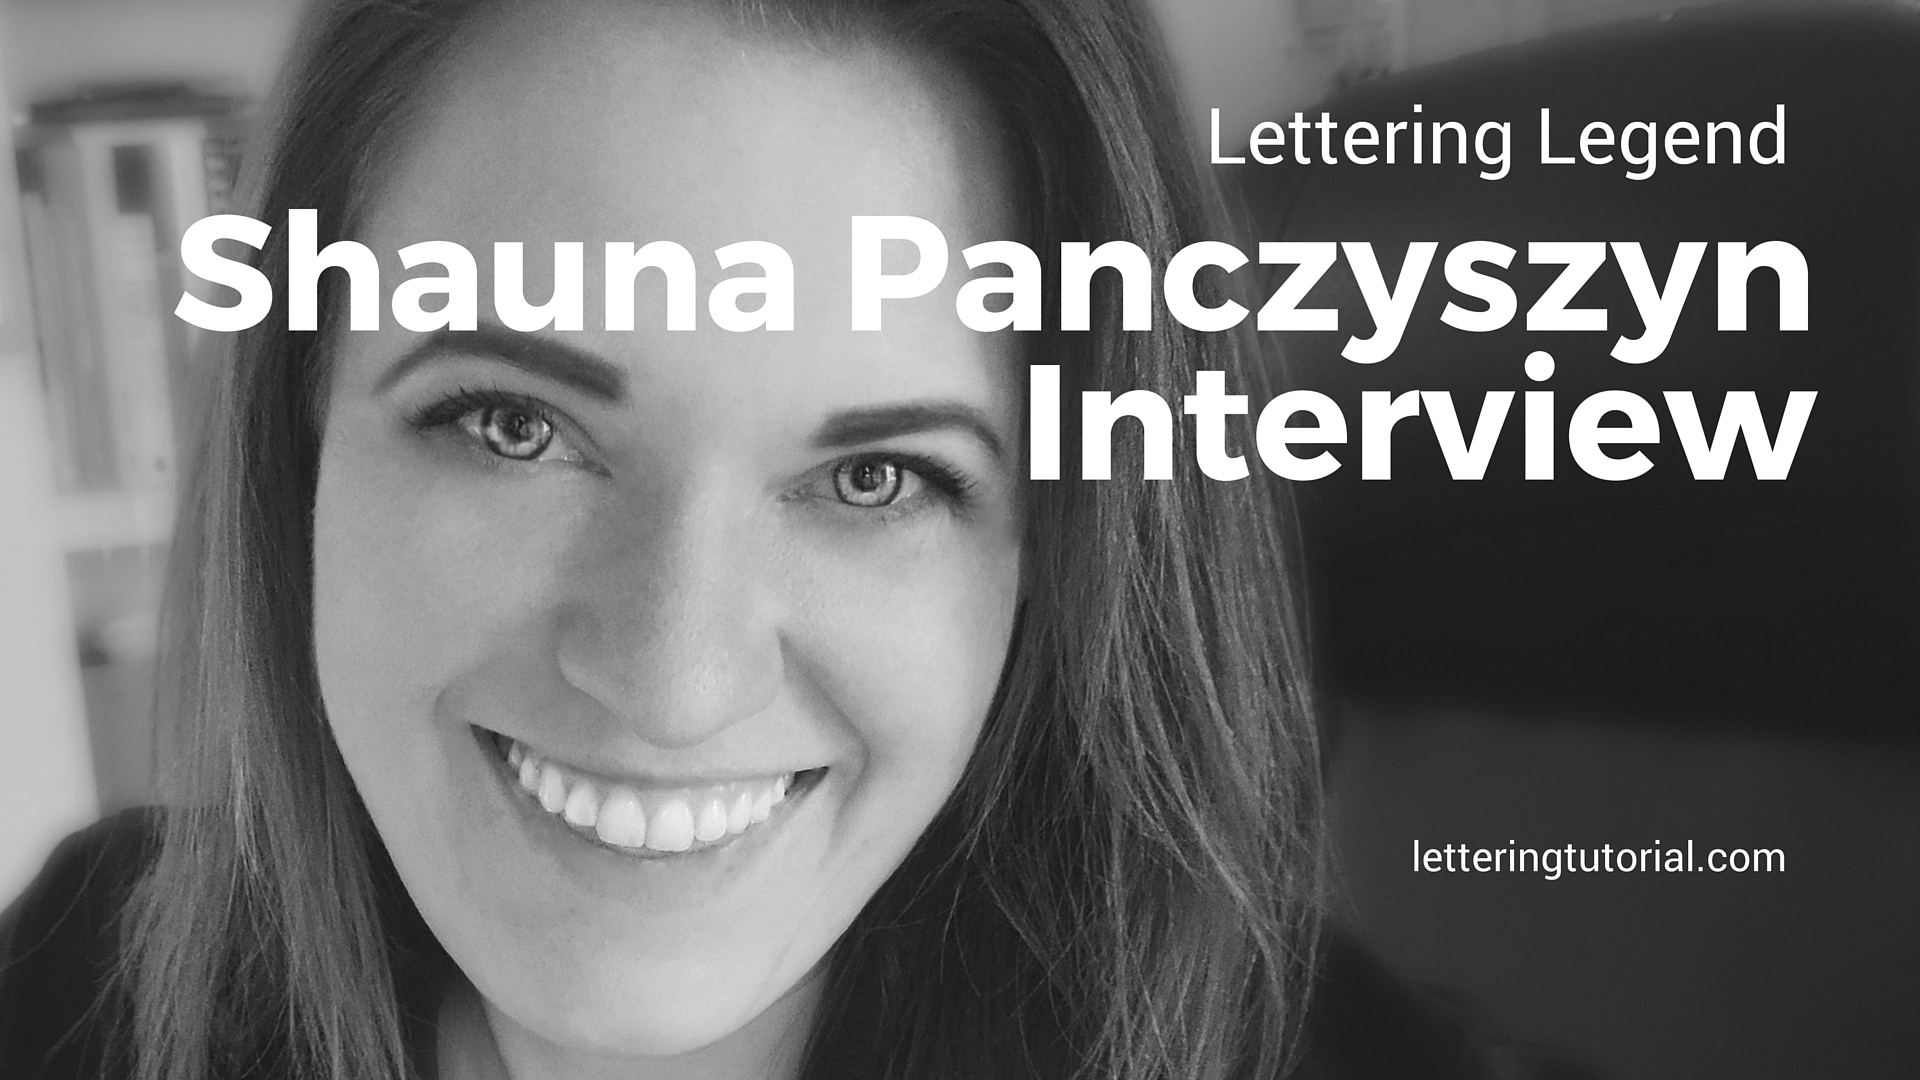 Lettering Legend Shauna Panczyszyn Interview - Lettering Tutorial